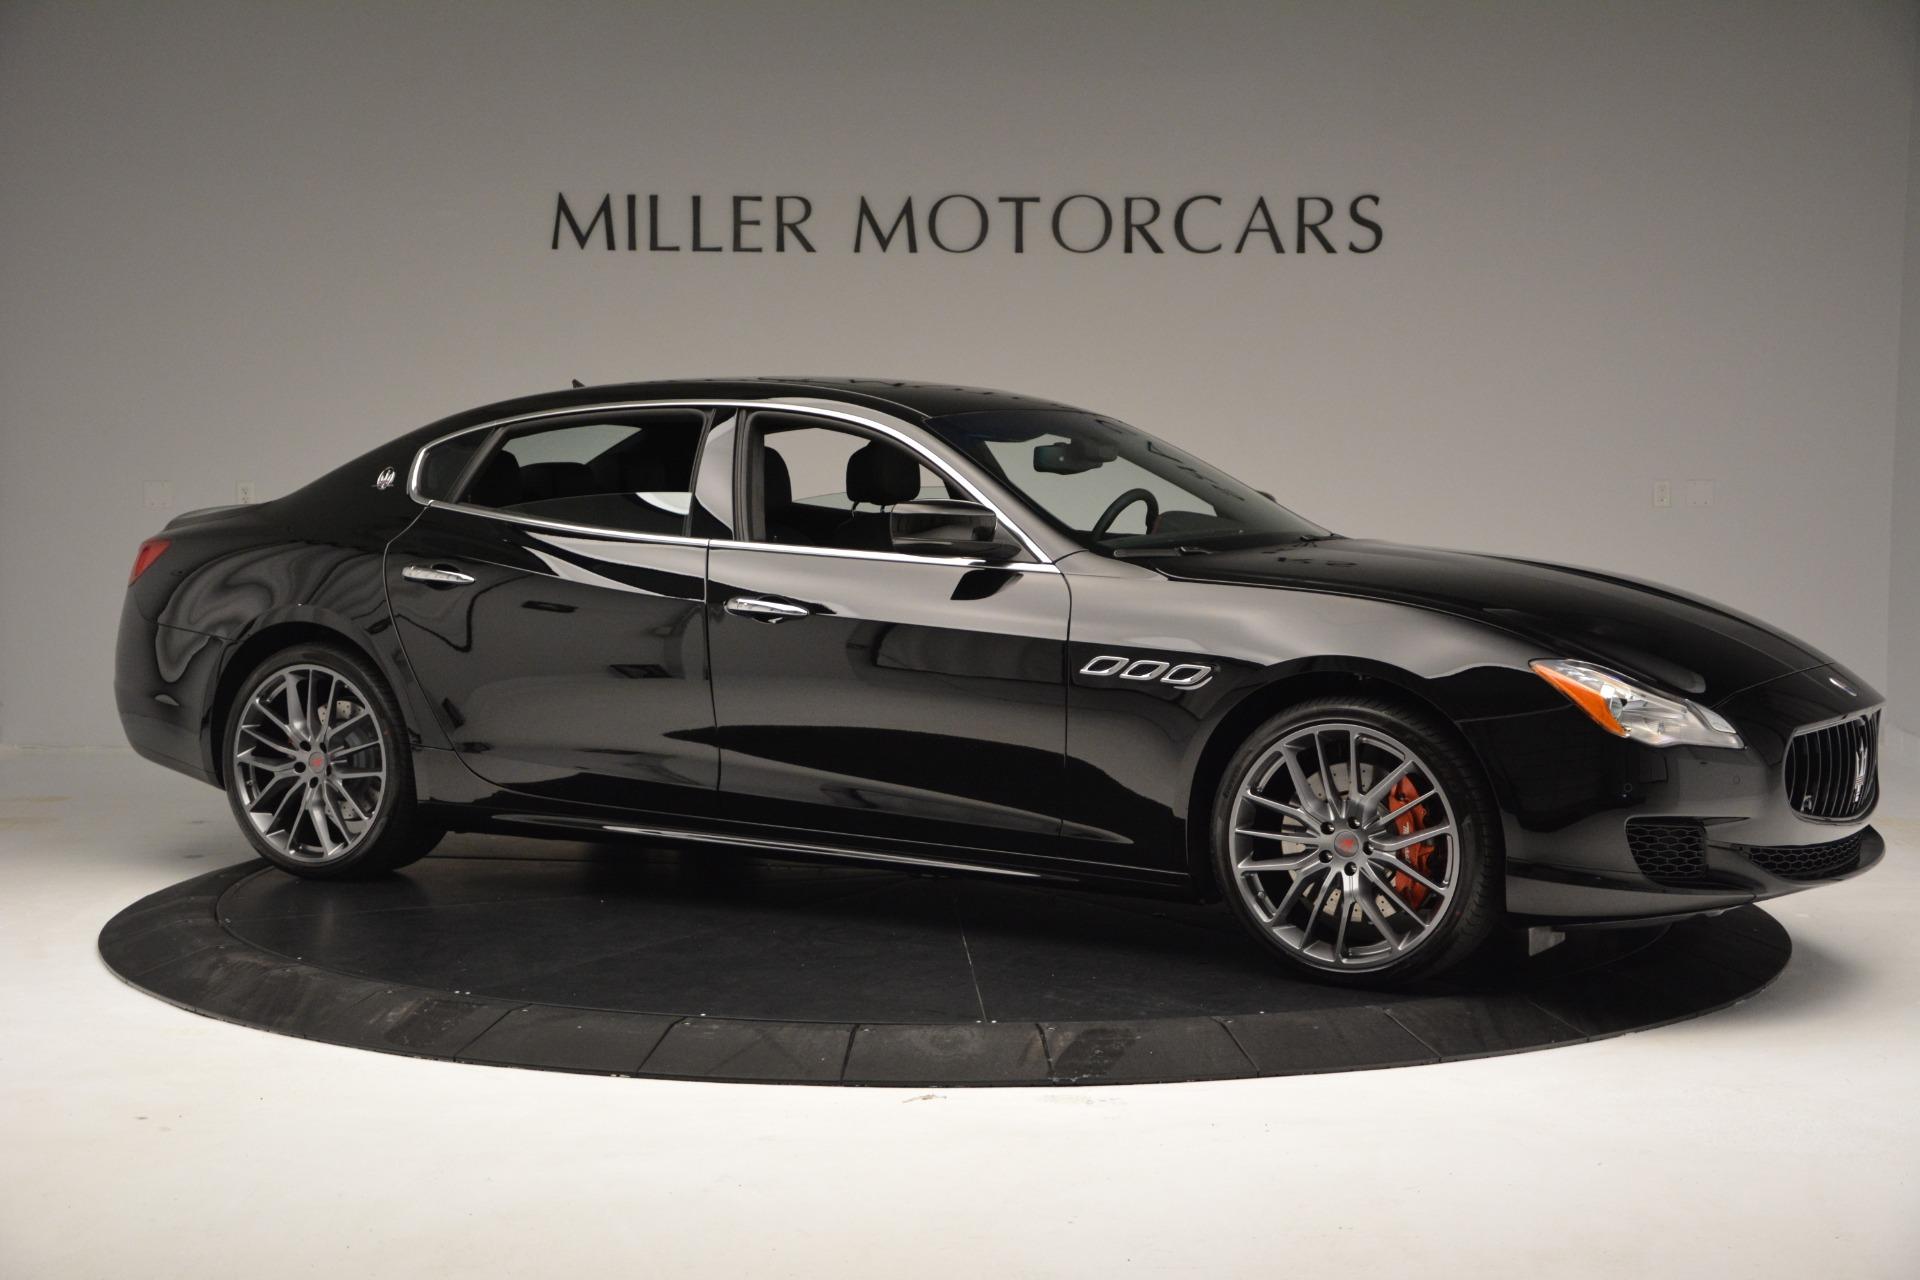 Used 2015 Maserati Quattroporte GTS For Sale In Westport, CT 2993_p10